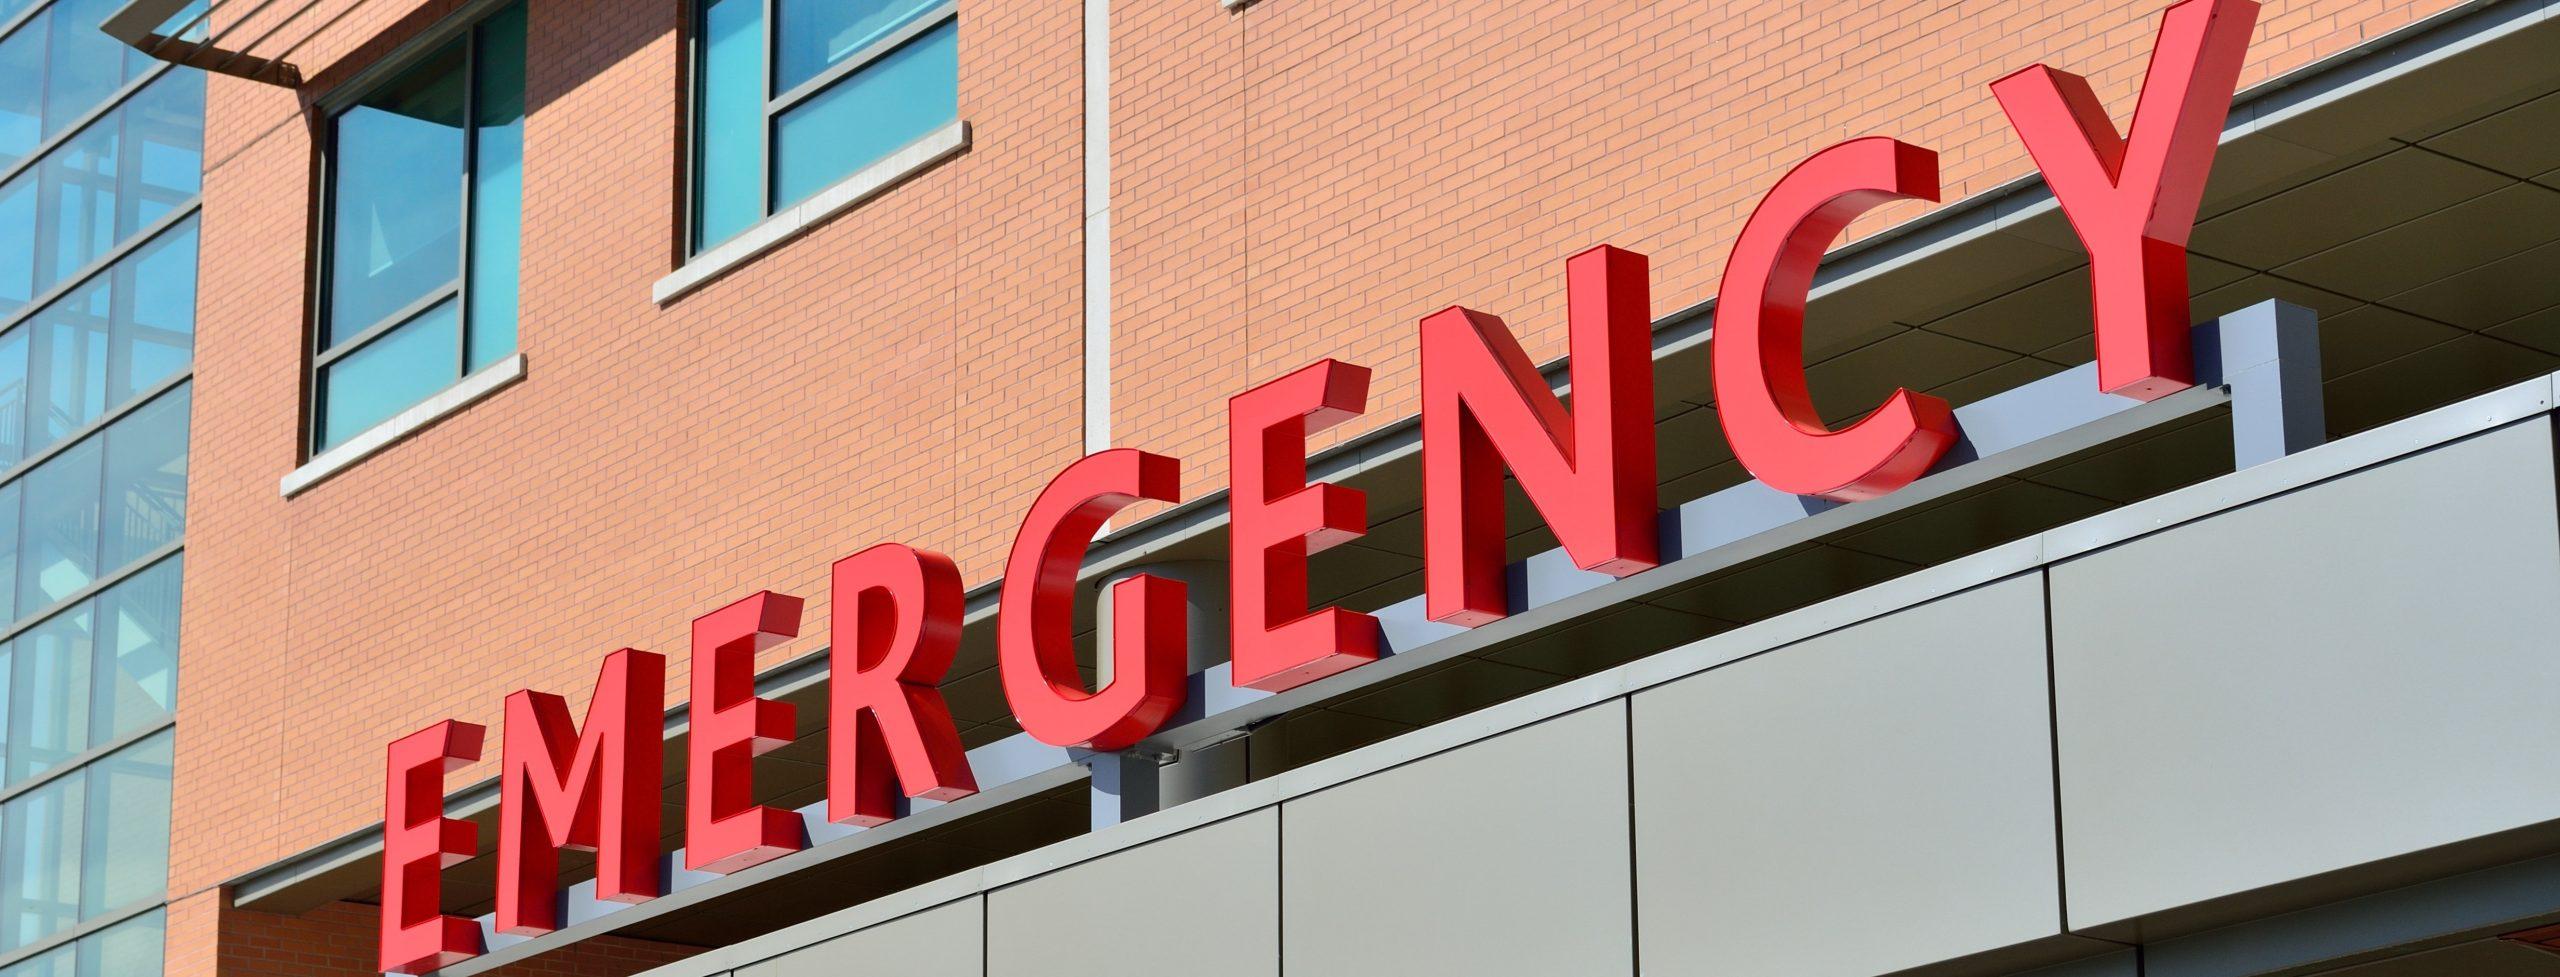 Hospital, Emergency, Building